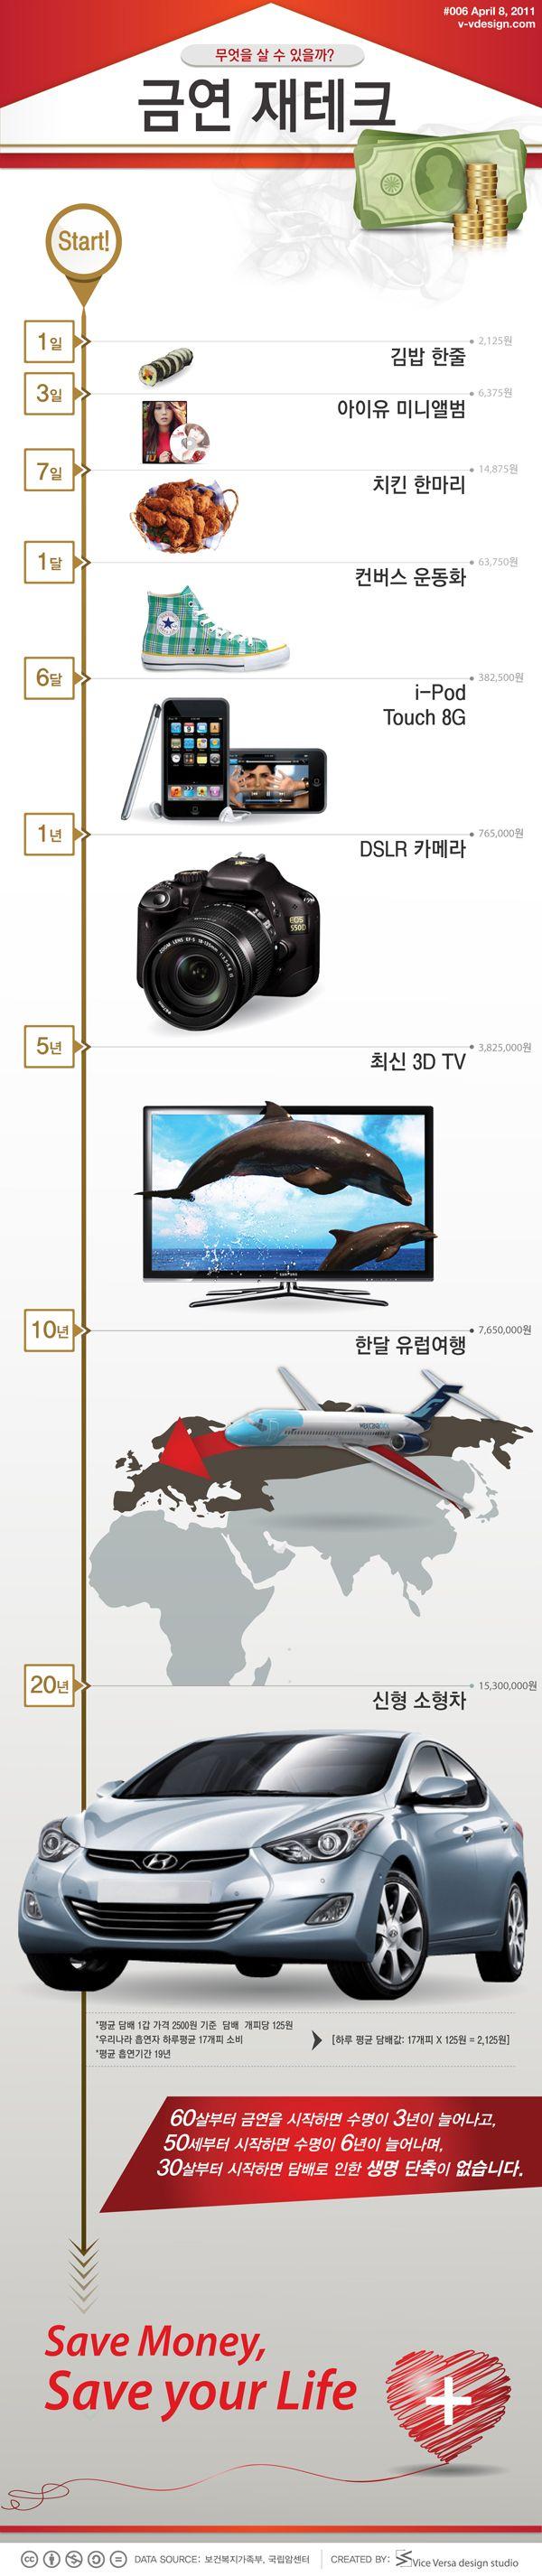 [Infographic] 금연 재테크에 관한 인포그래픽